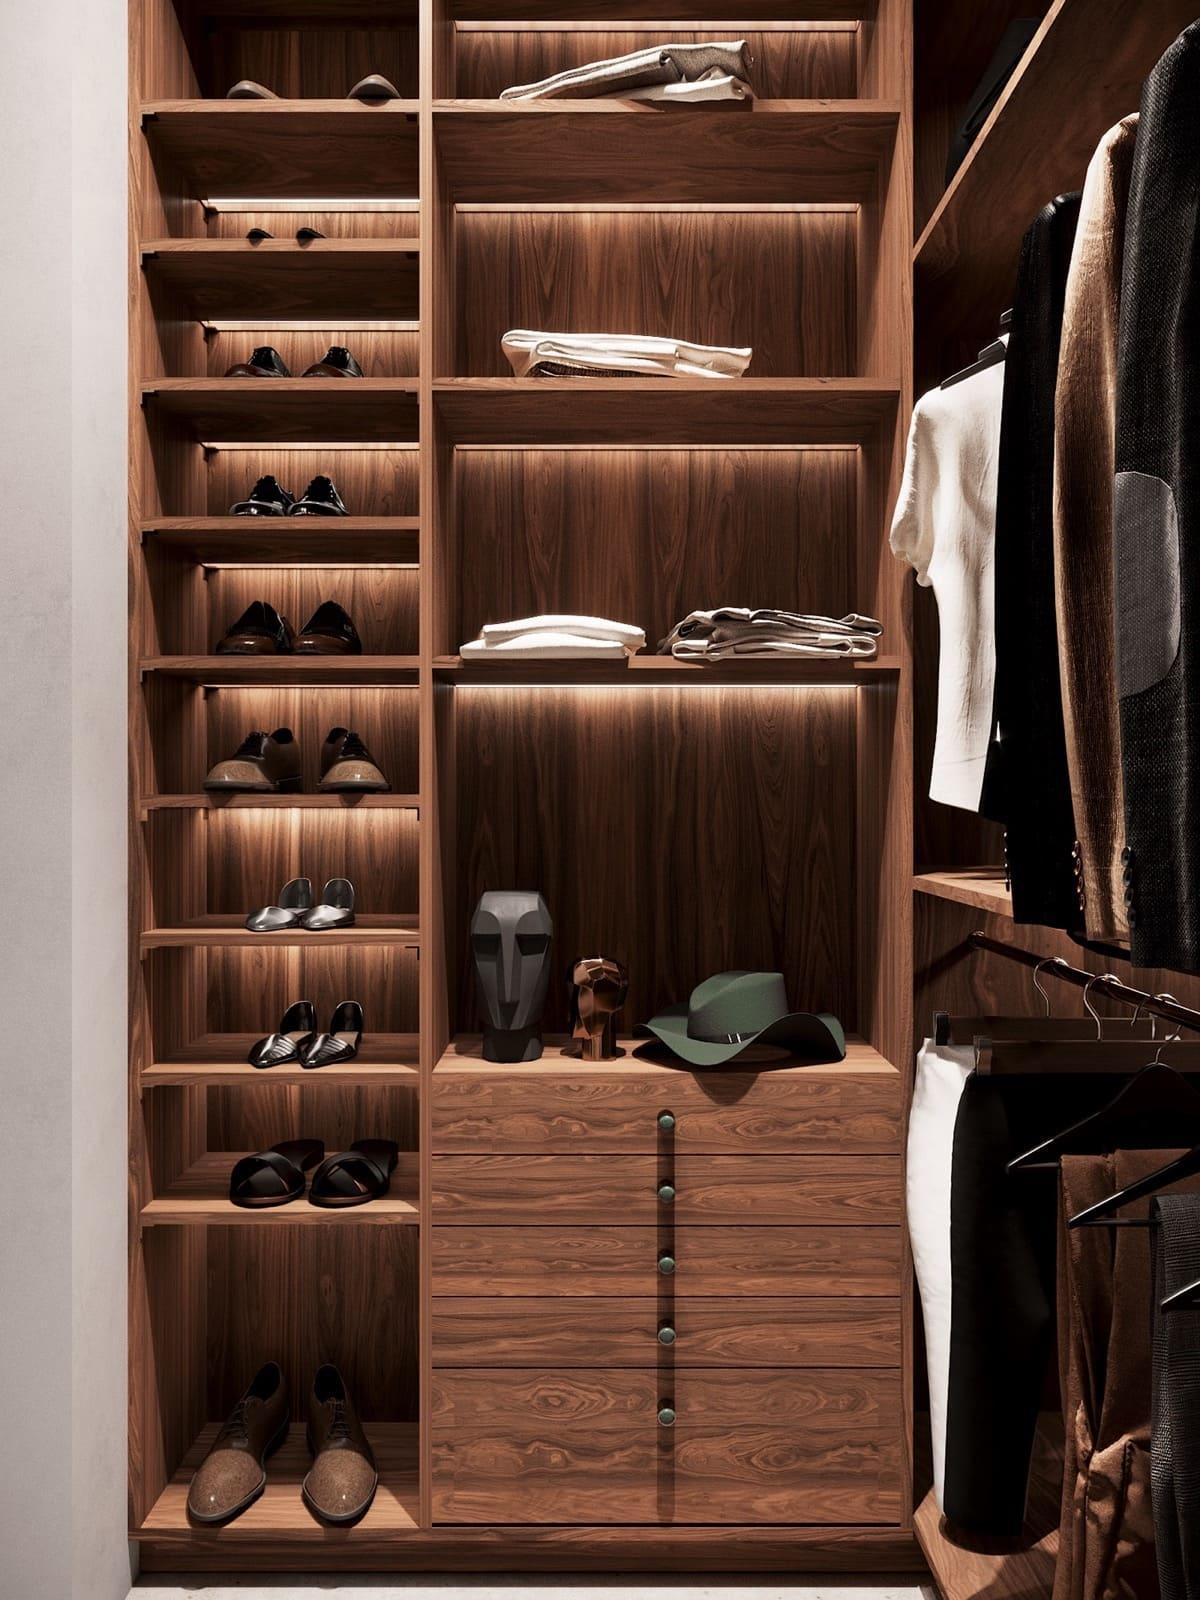 дизайн интерьера модной квартиры фото 69